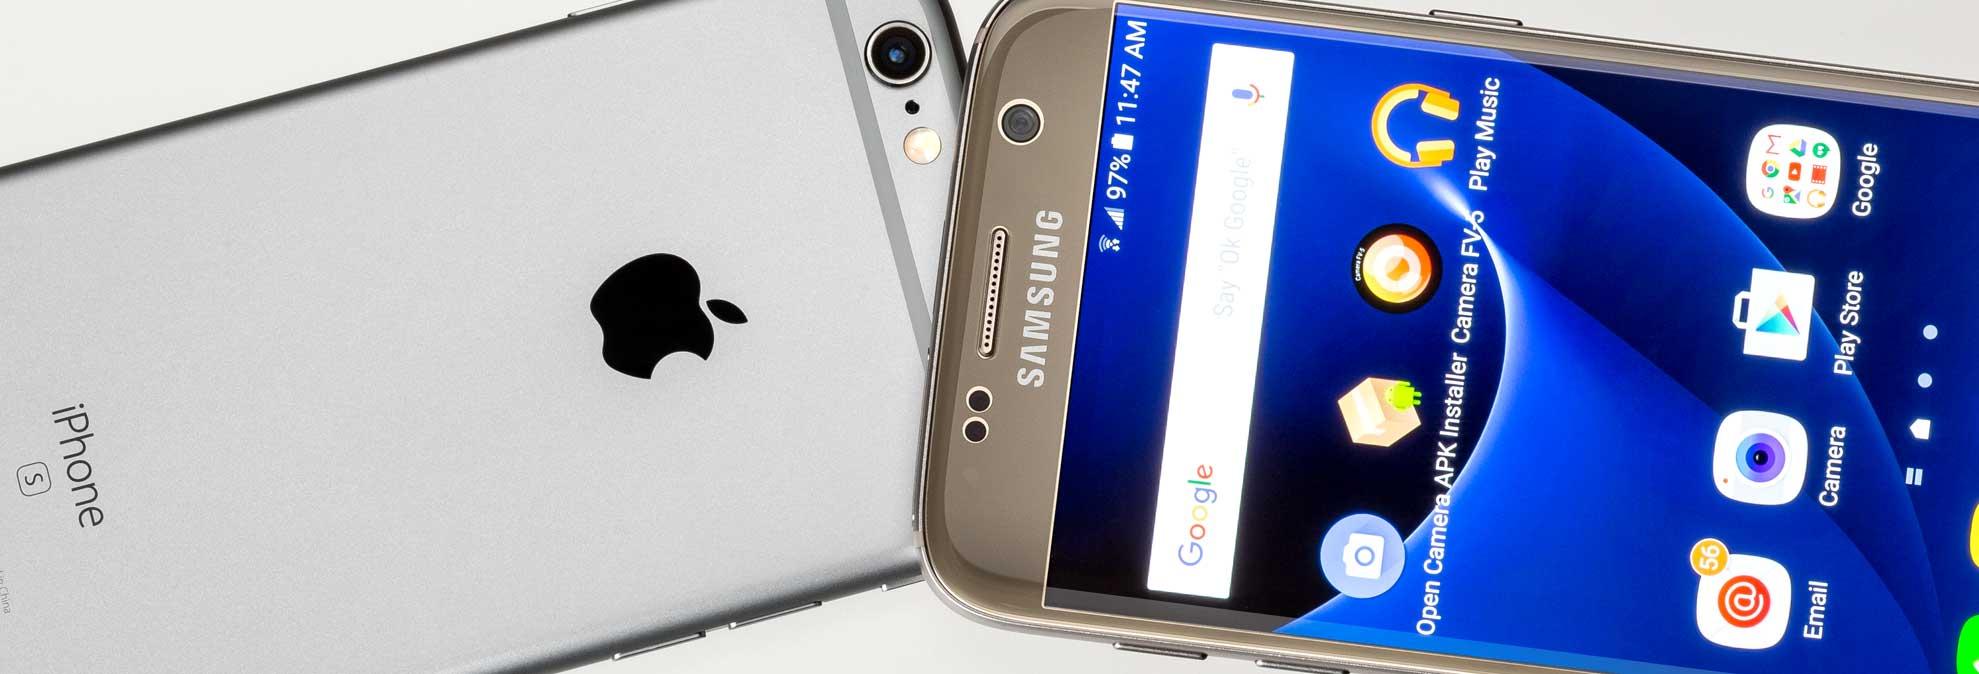 Head-to-Head: Samsung Galaxy S7 vs  iPhone 6s - Consumer Reports